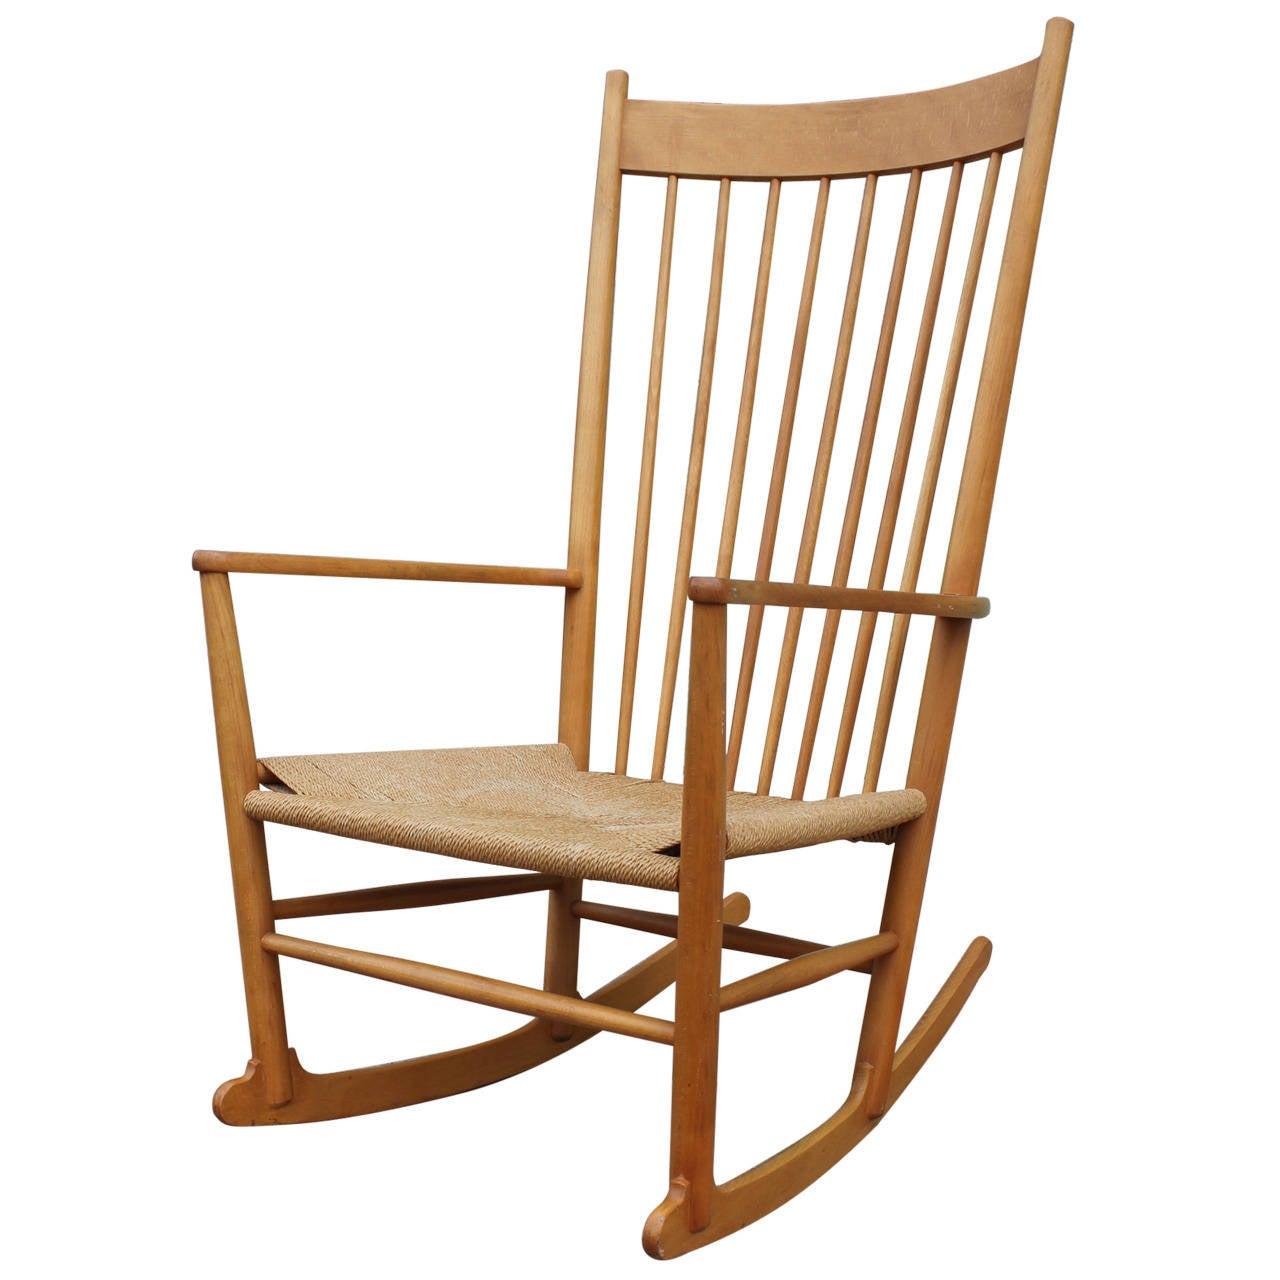 hans wegner rocking chair how to make bags for school j16 at 1stdibs